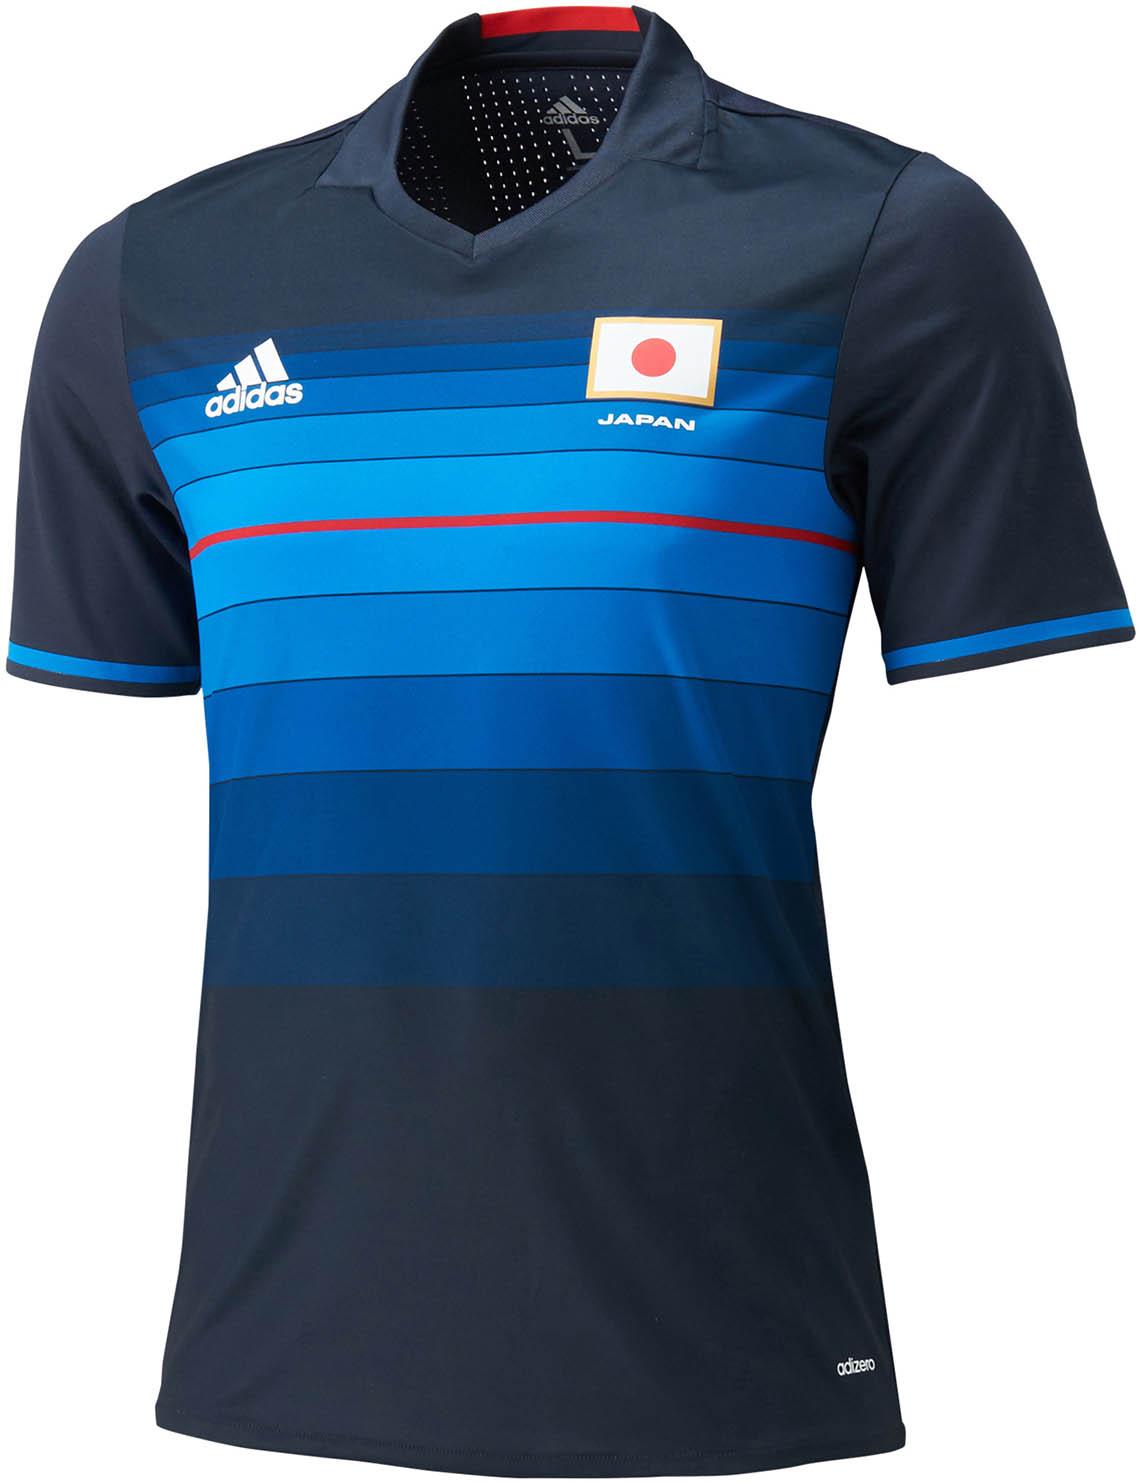 olympia japan